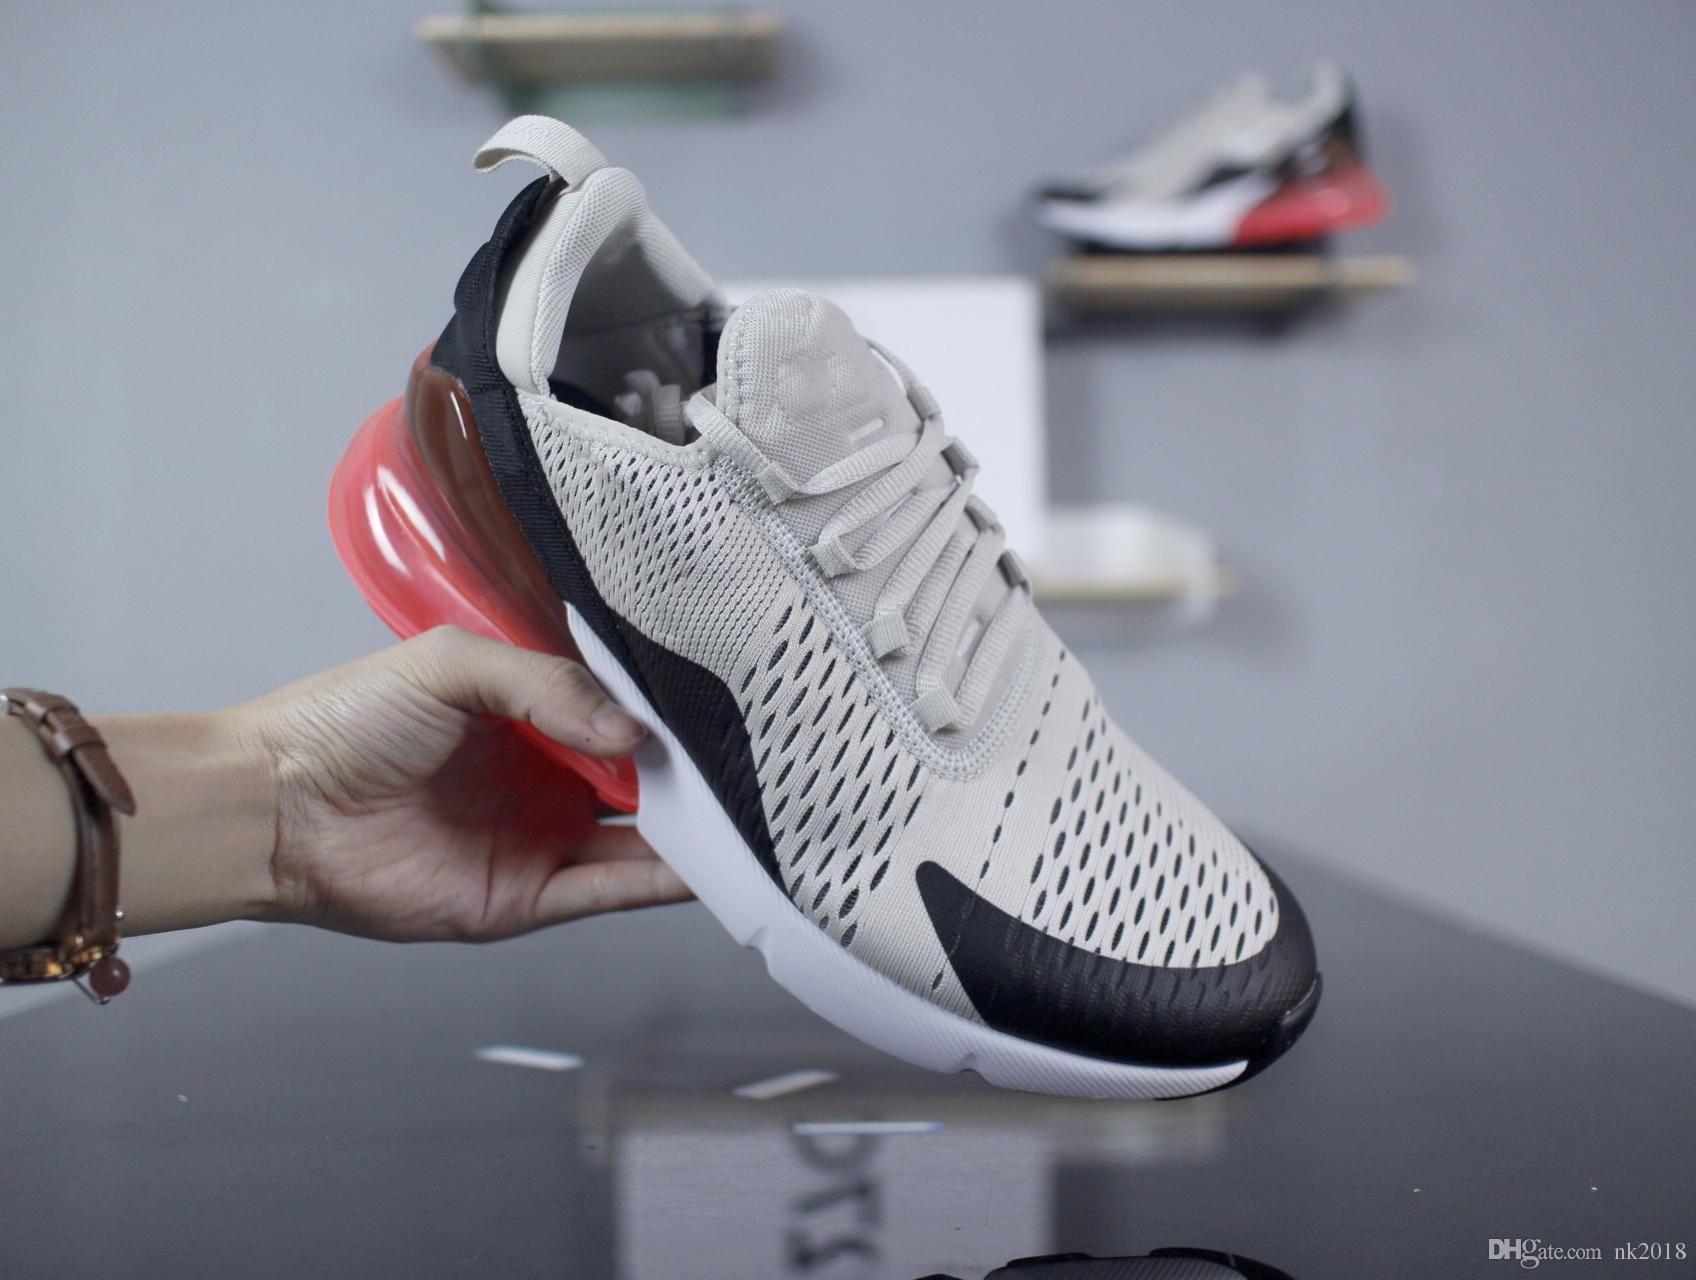 Compre Nike Nike Nike Air Max Dhl Buena Calidad 2018 Nuevos Zapatos Para 589490